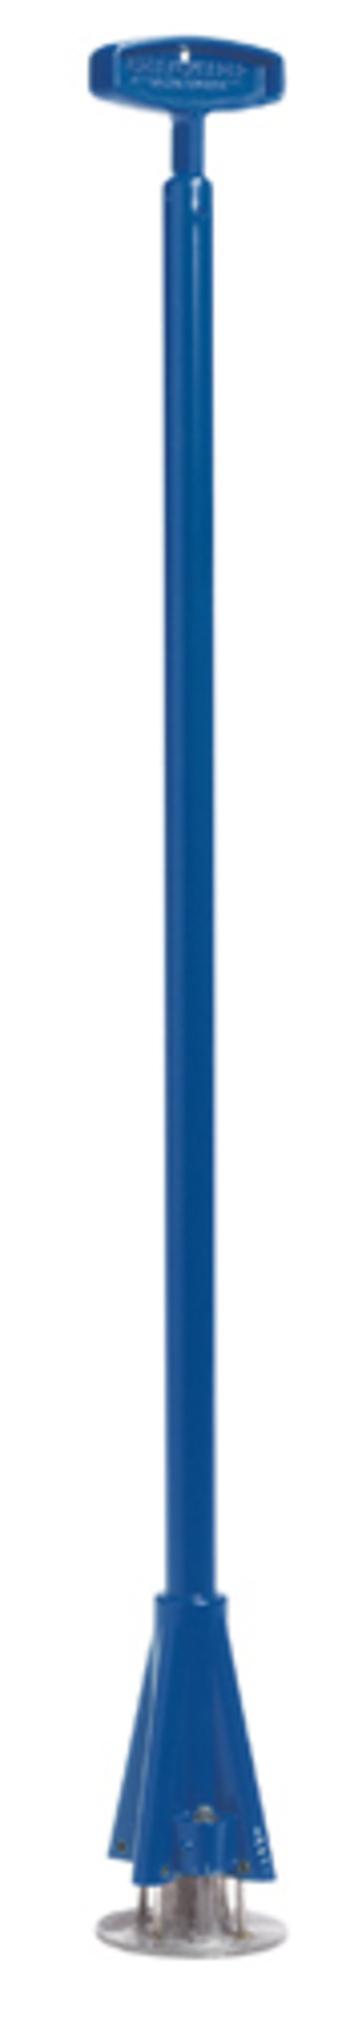 GREENSKEEPER